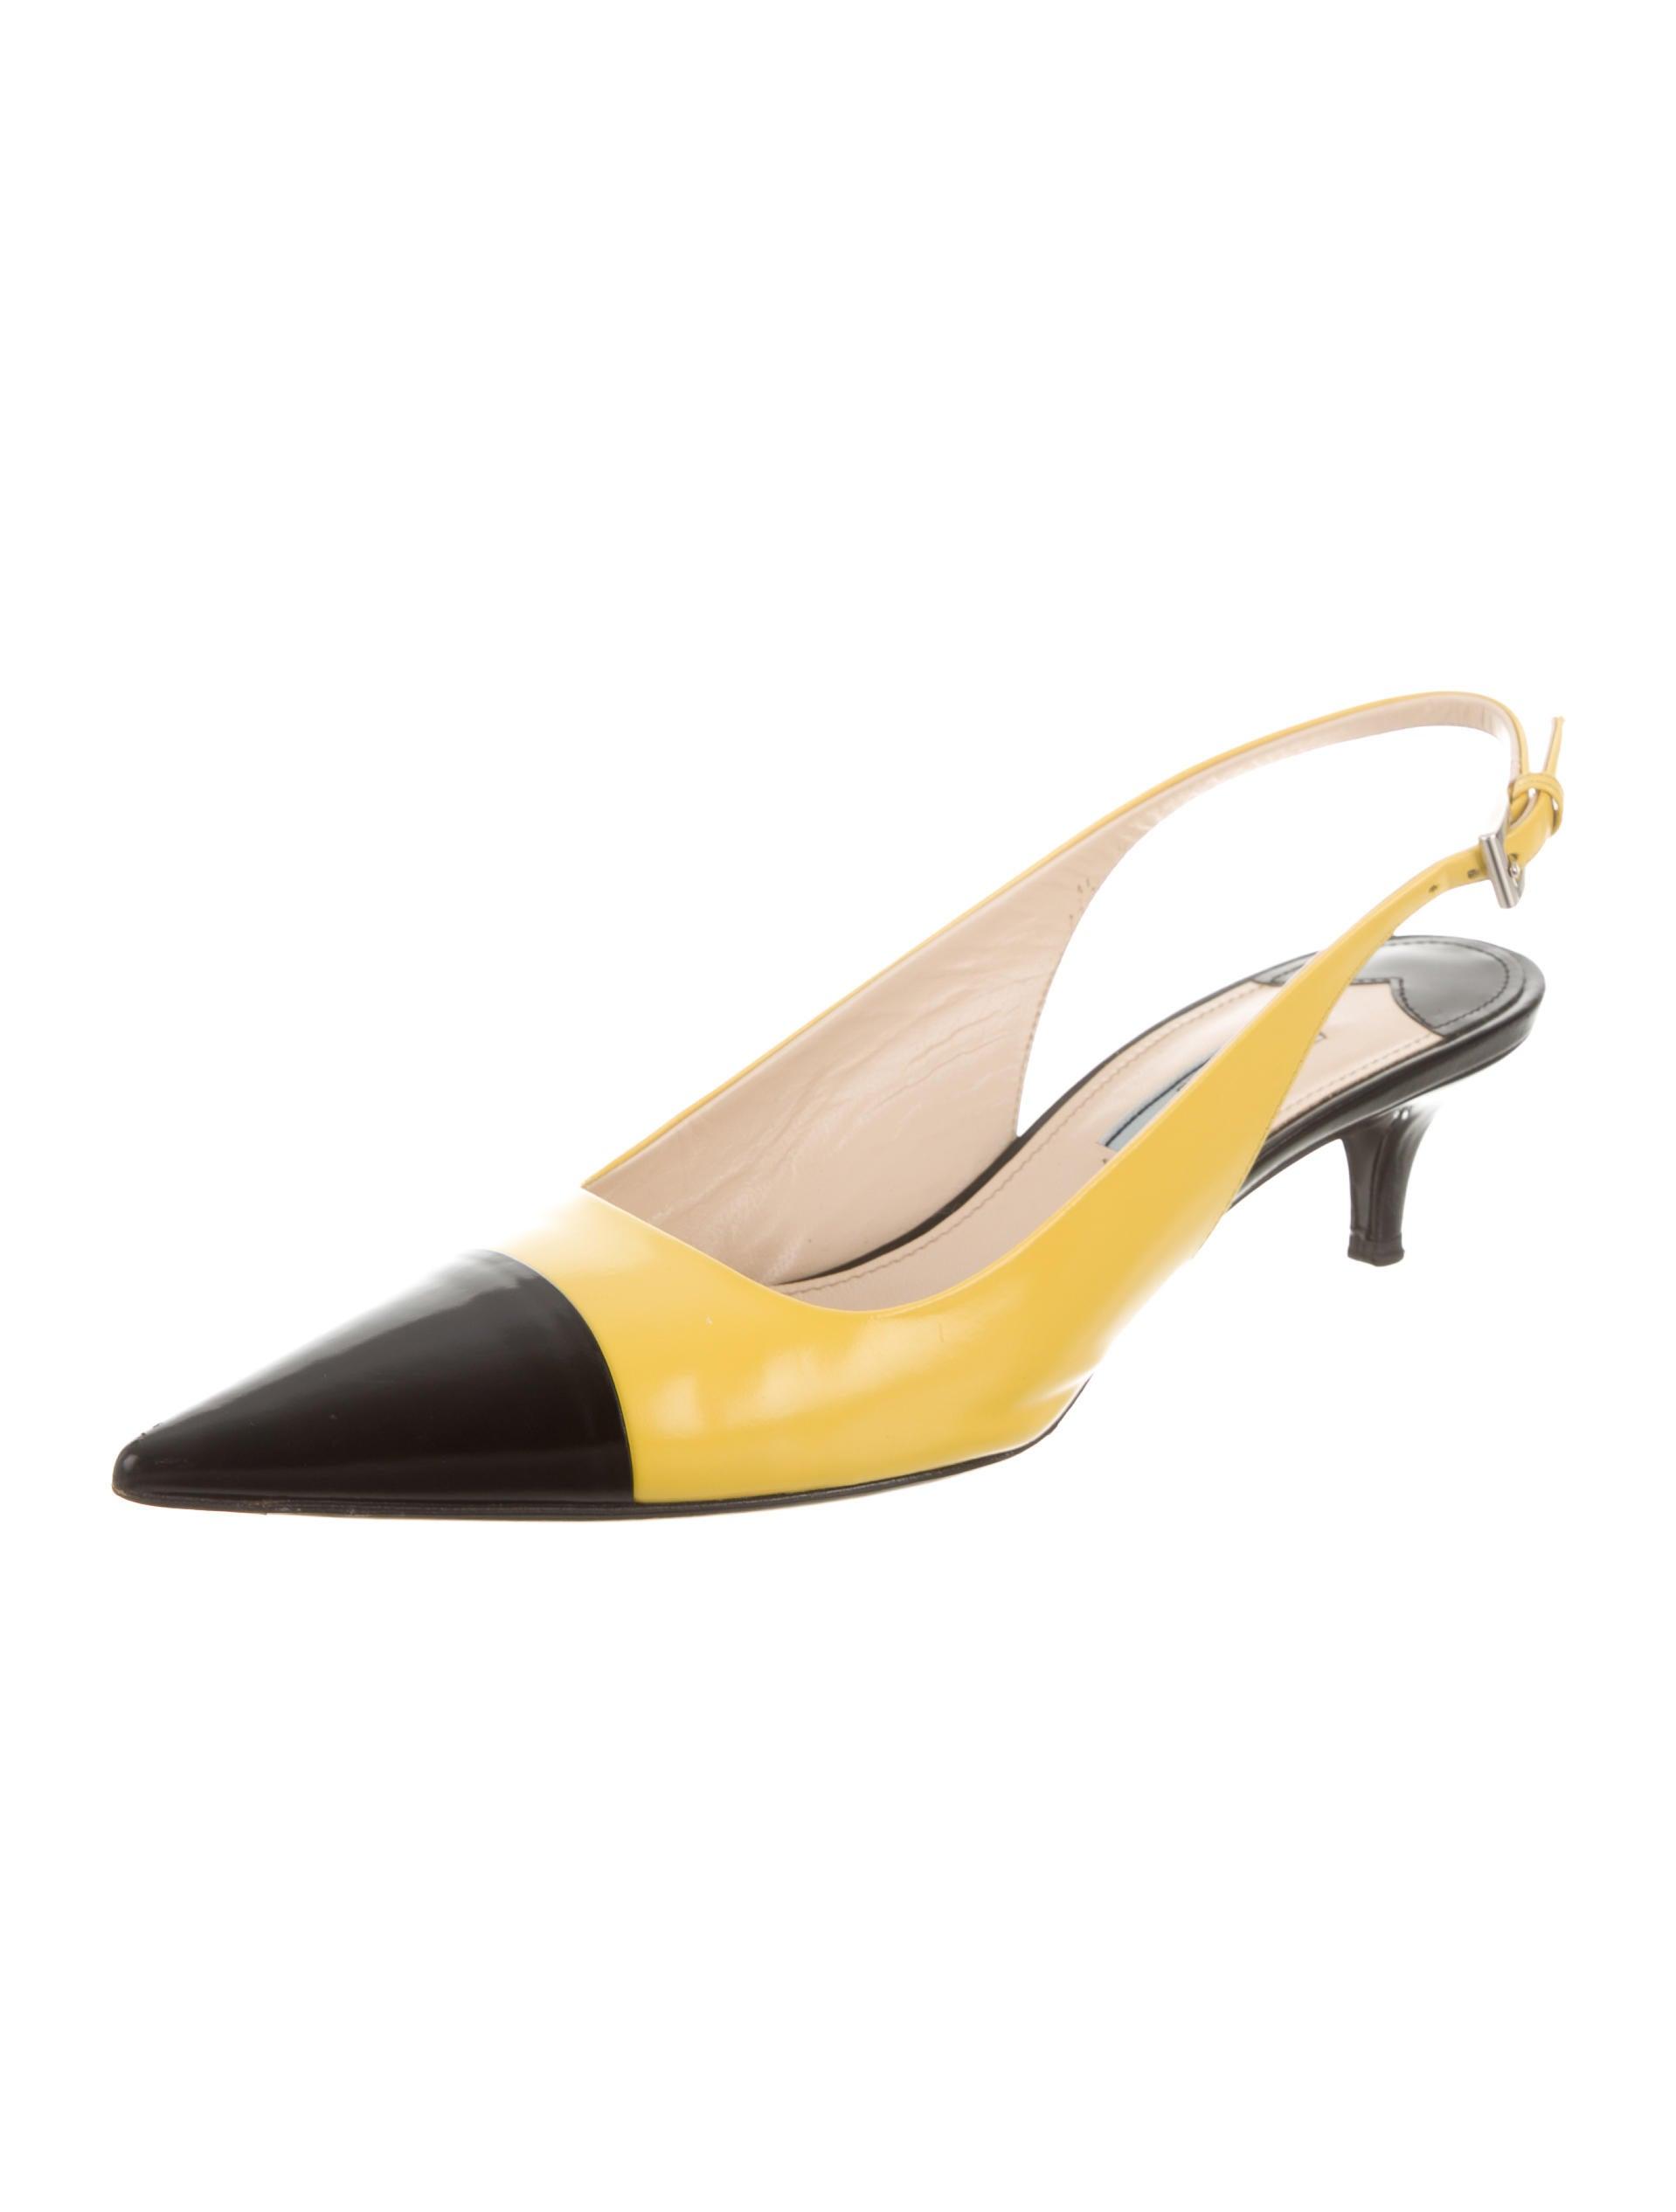 Prada Leather Slingback Cap Toe Pumps Shoes Pra108398